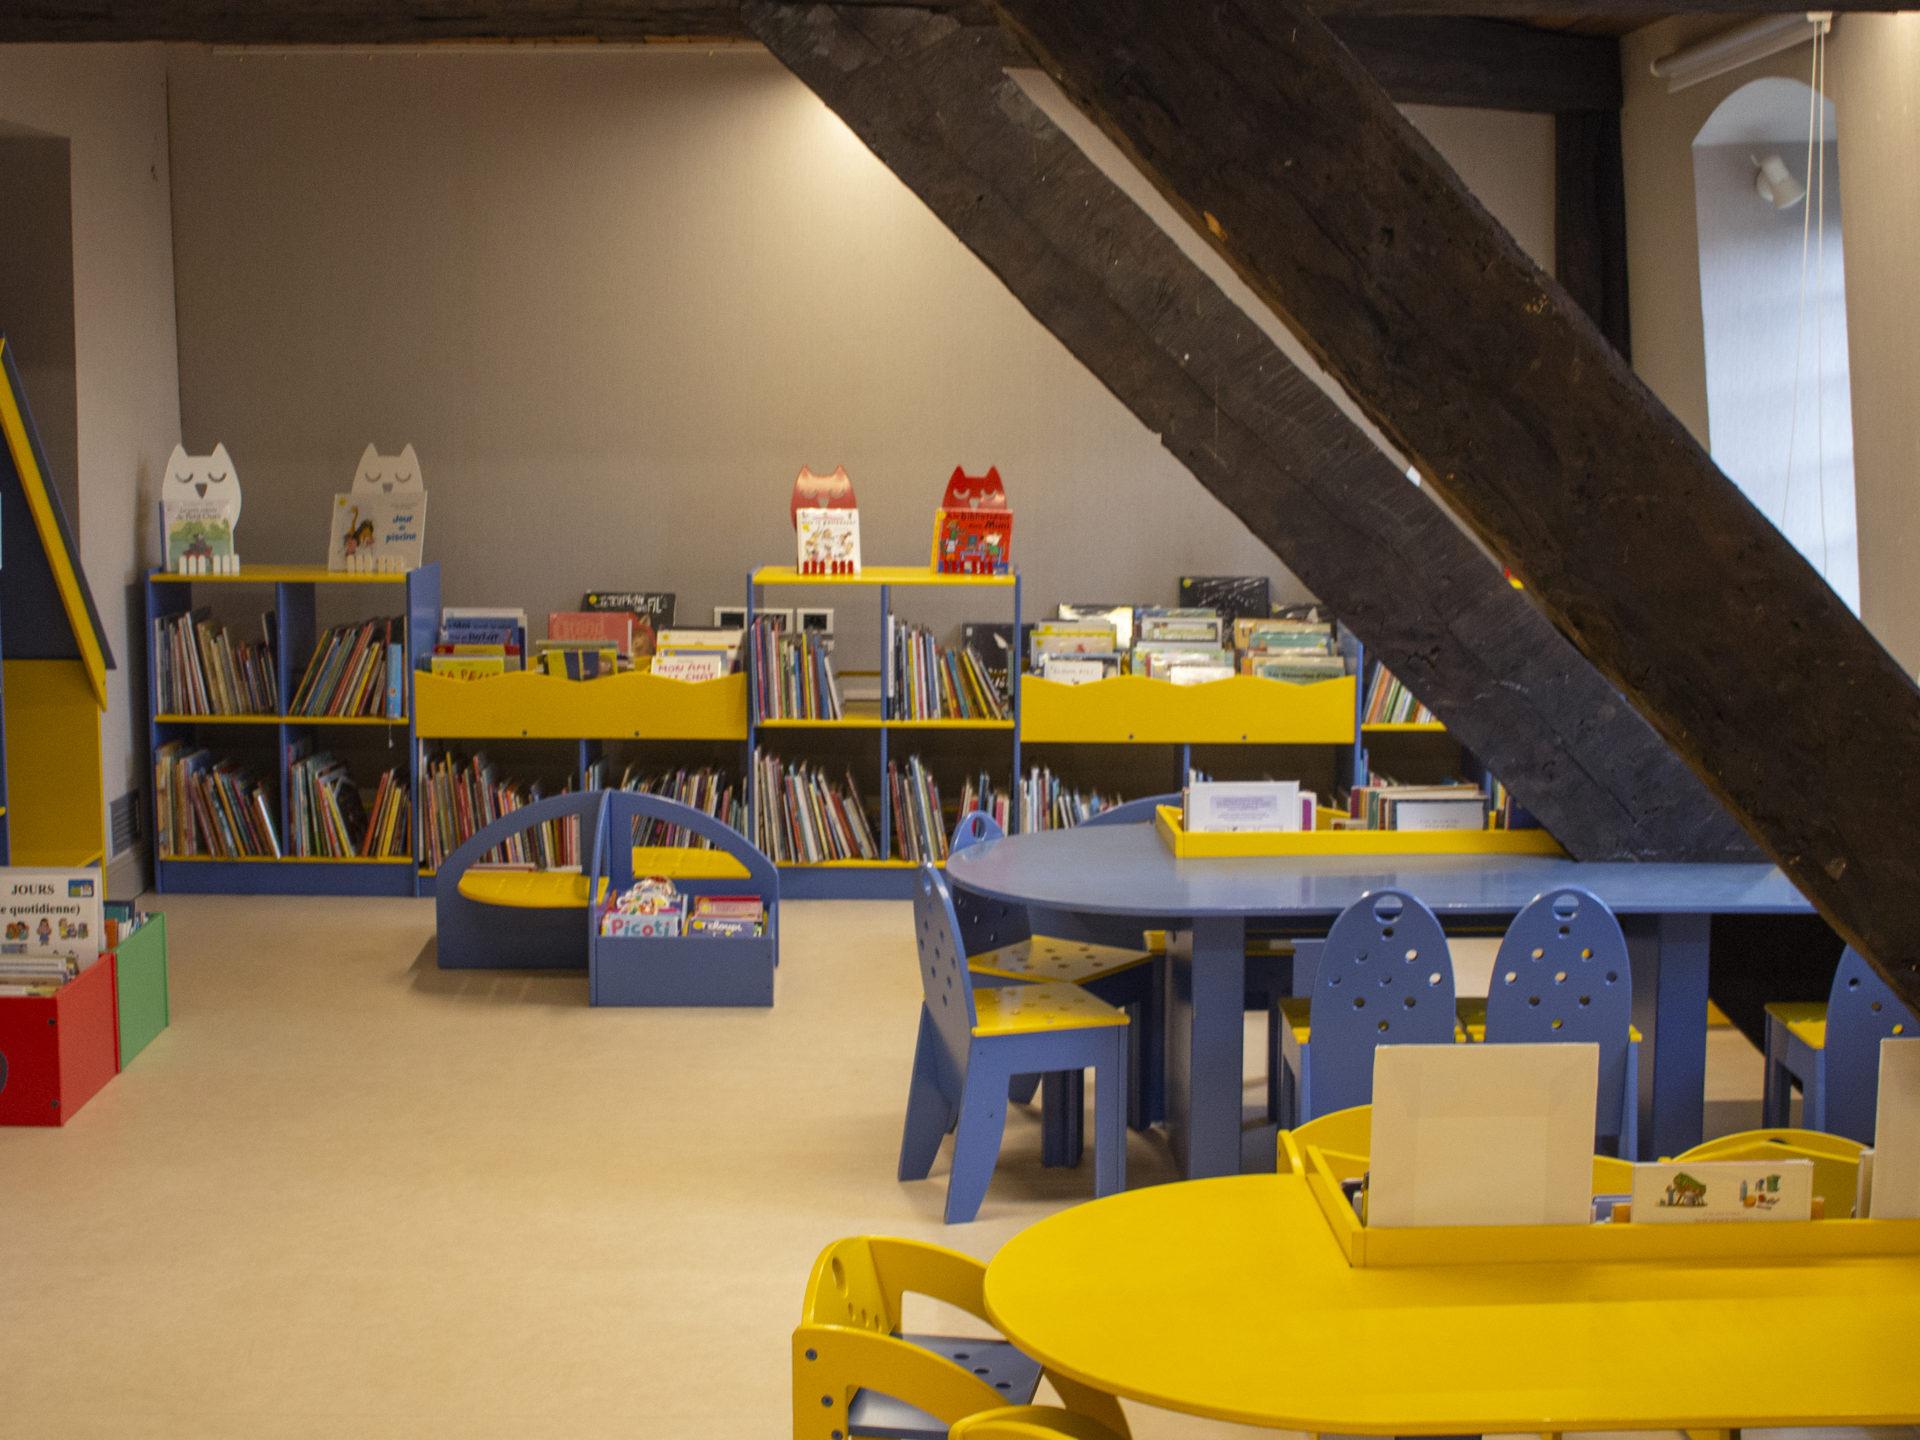 Bibliothèque Condorcet Montivilliers©Nathanelle Girard